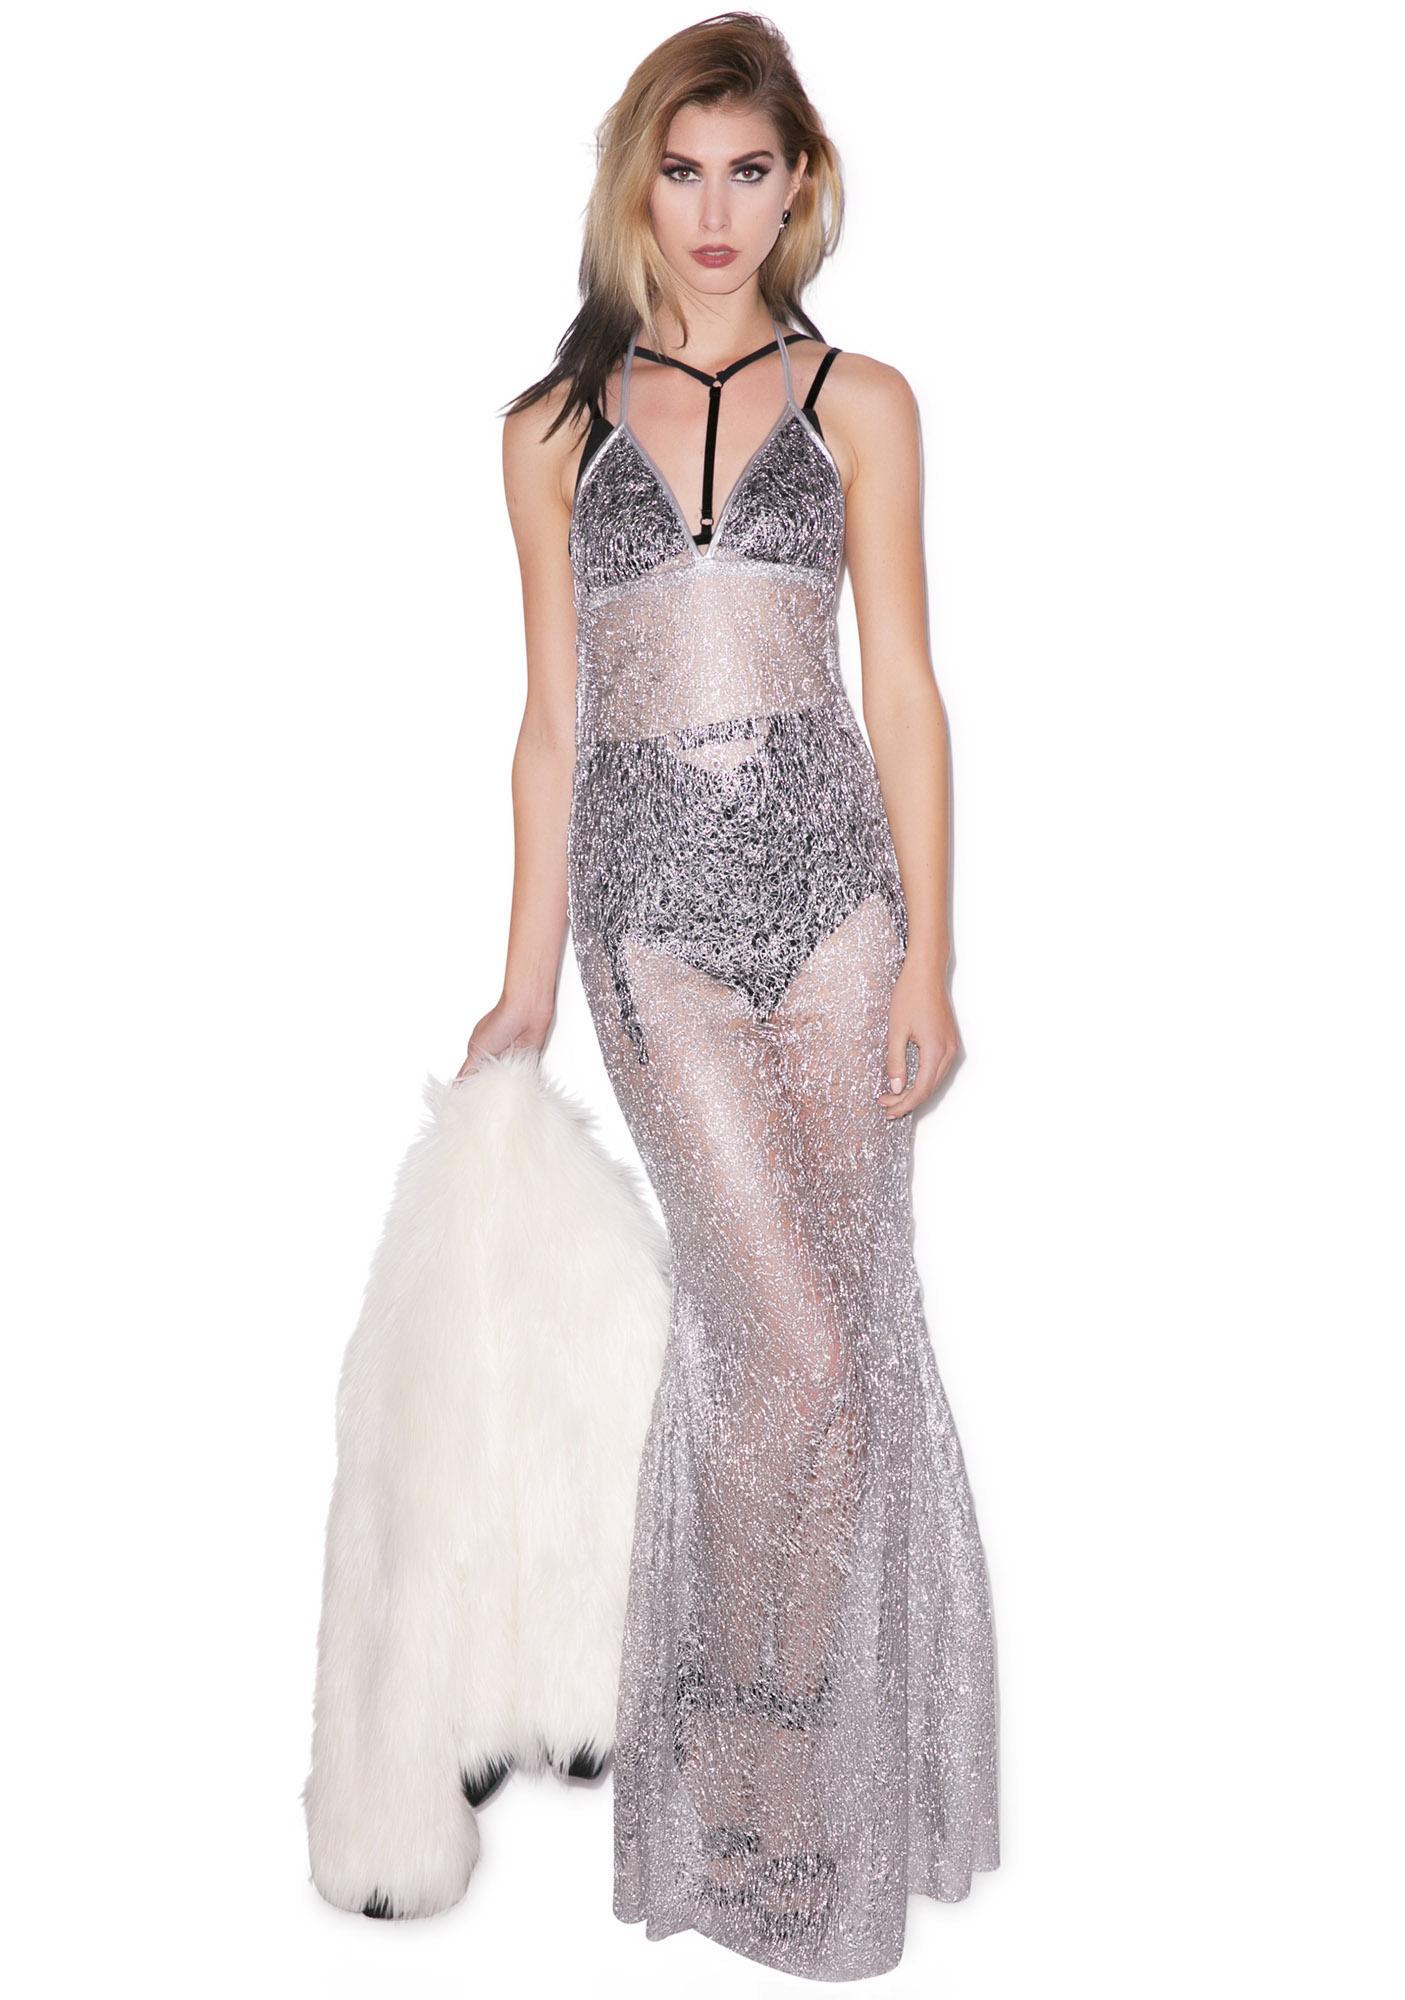 J Valentine Josie Stevens Spun Drizzle Gown | Dolls Kill